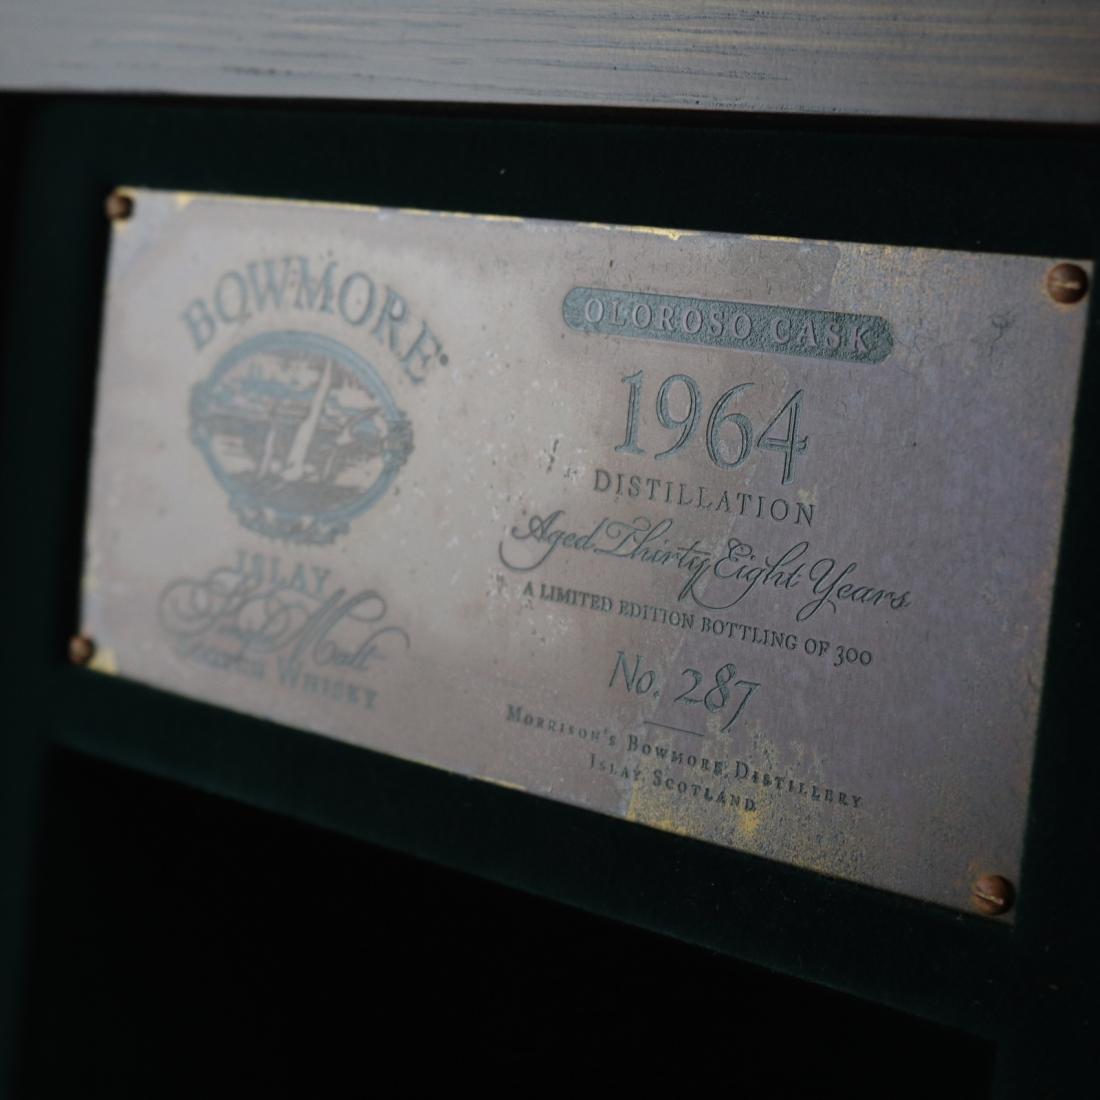 Bowmore 1964 Oloroso Cask 38 Year Old